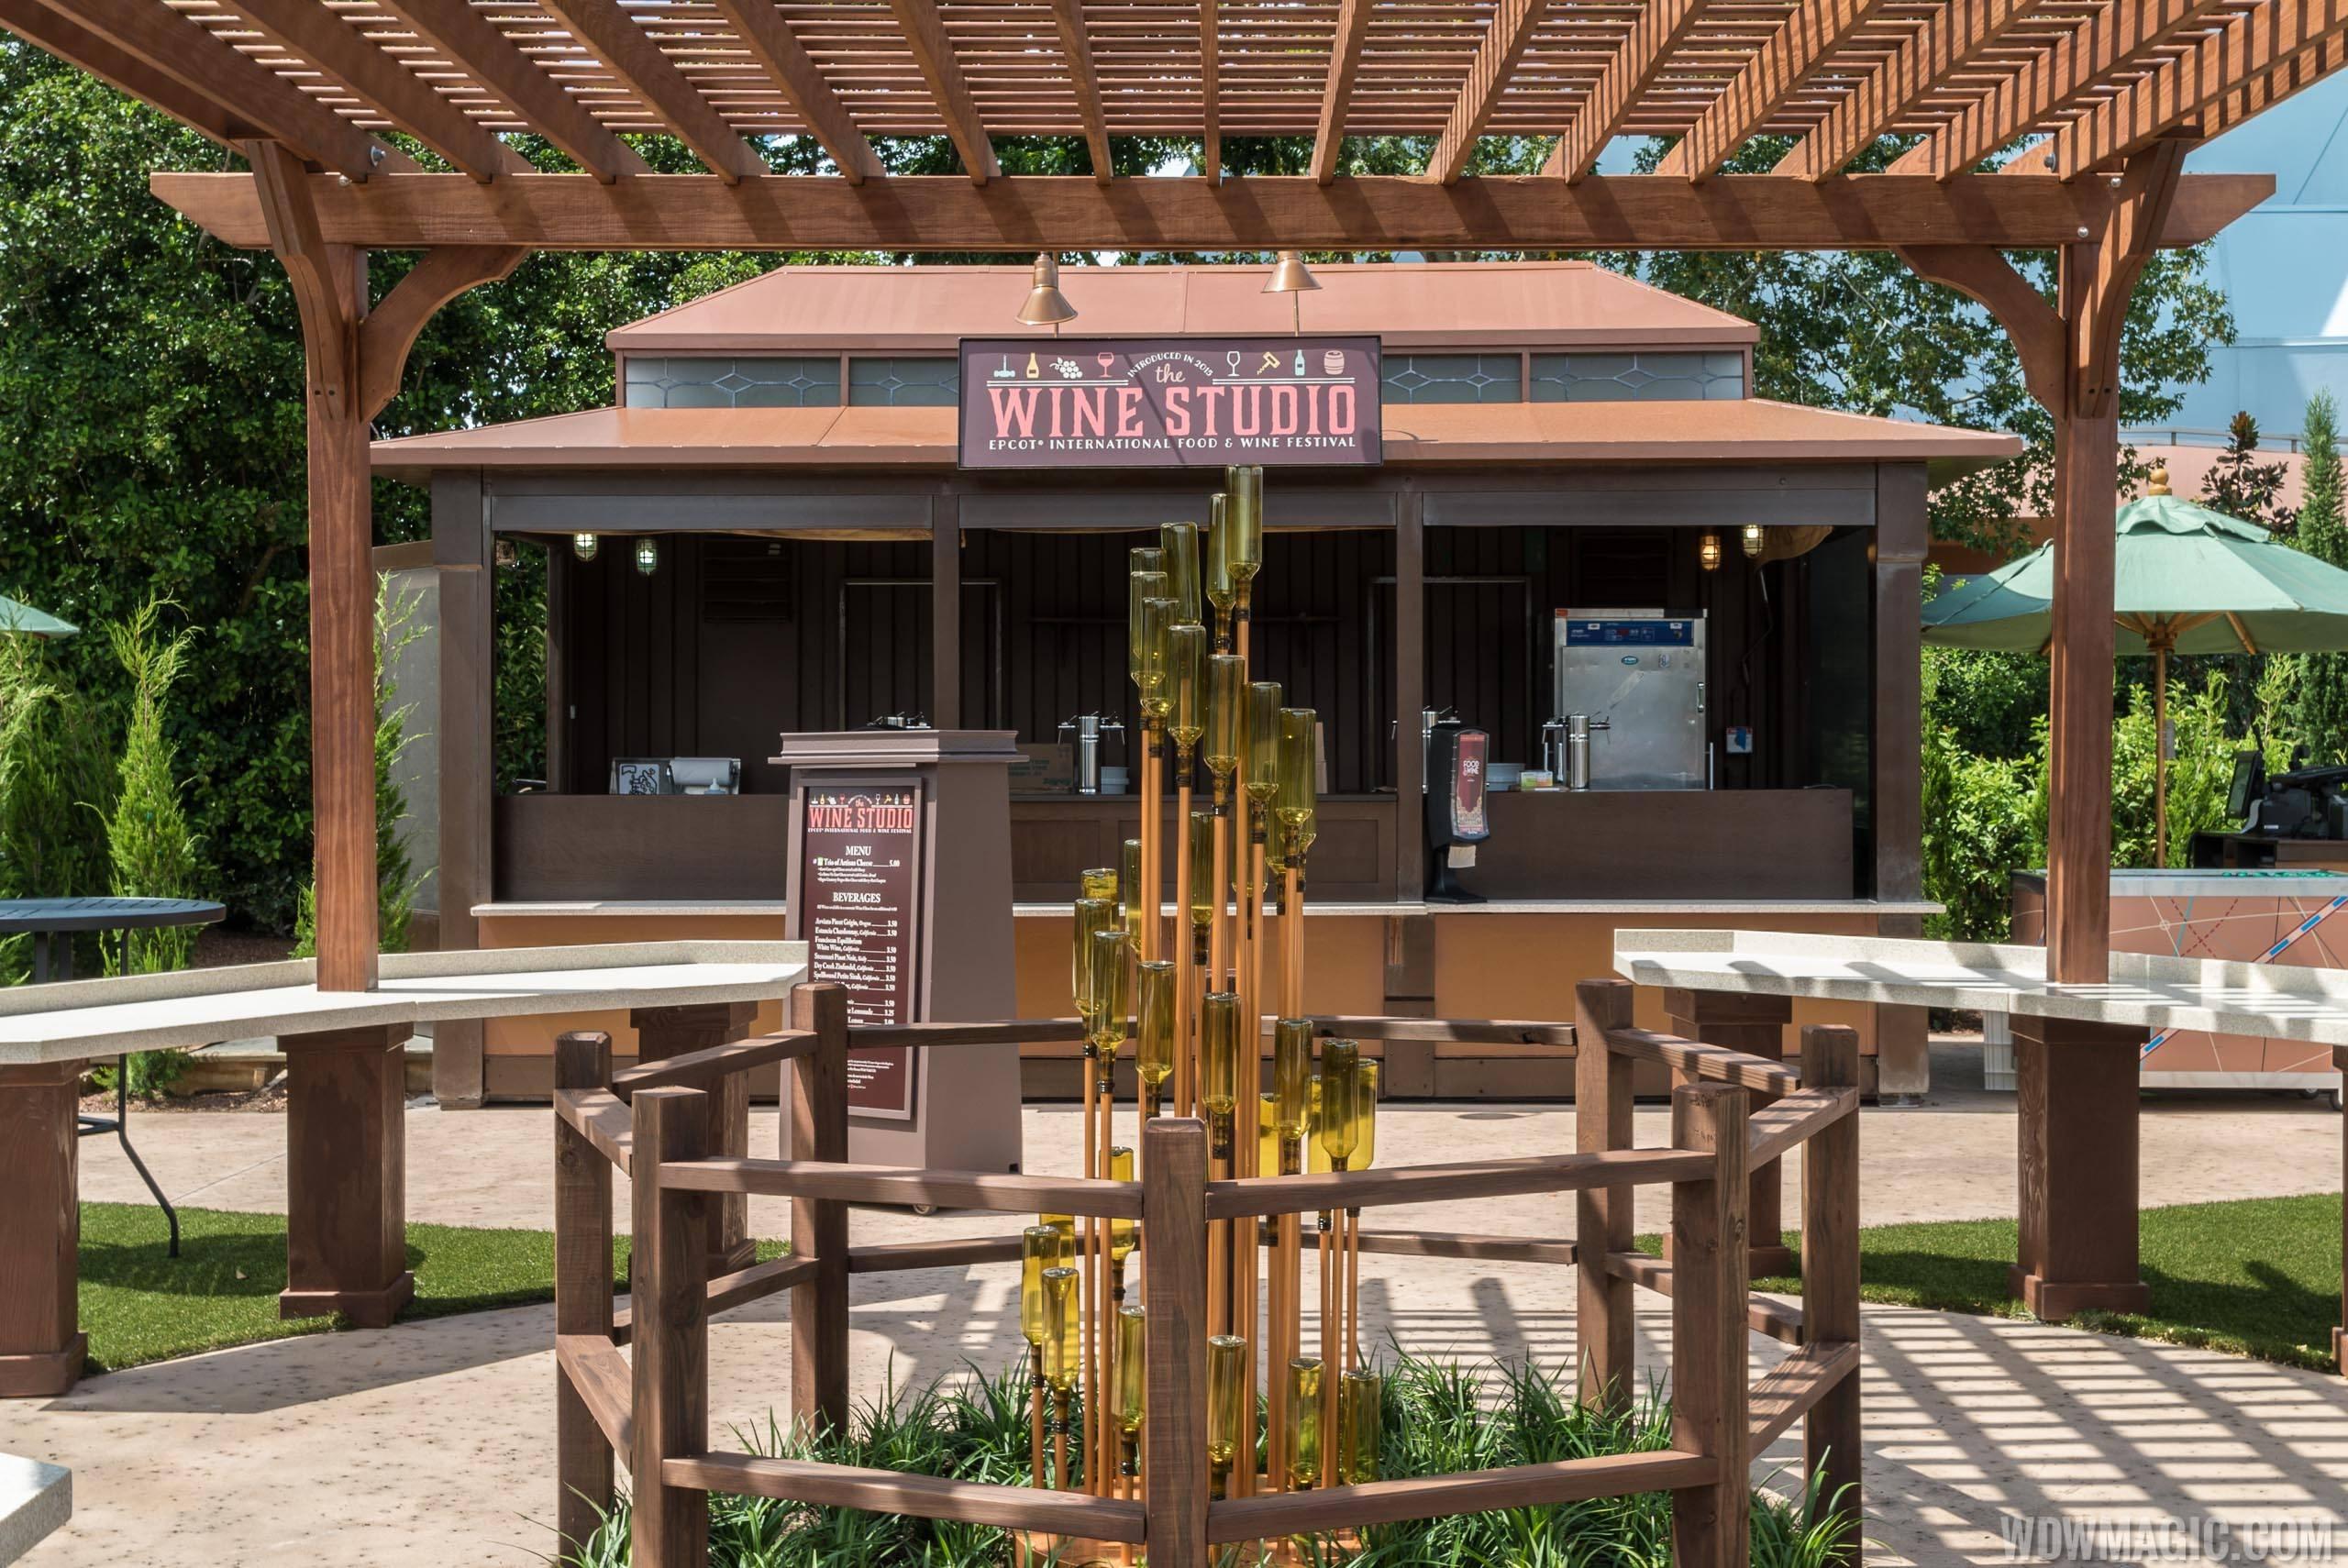 Wine Studio overview